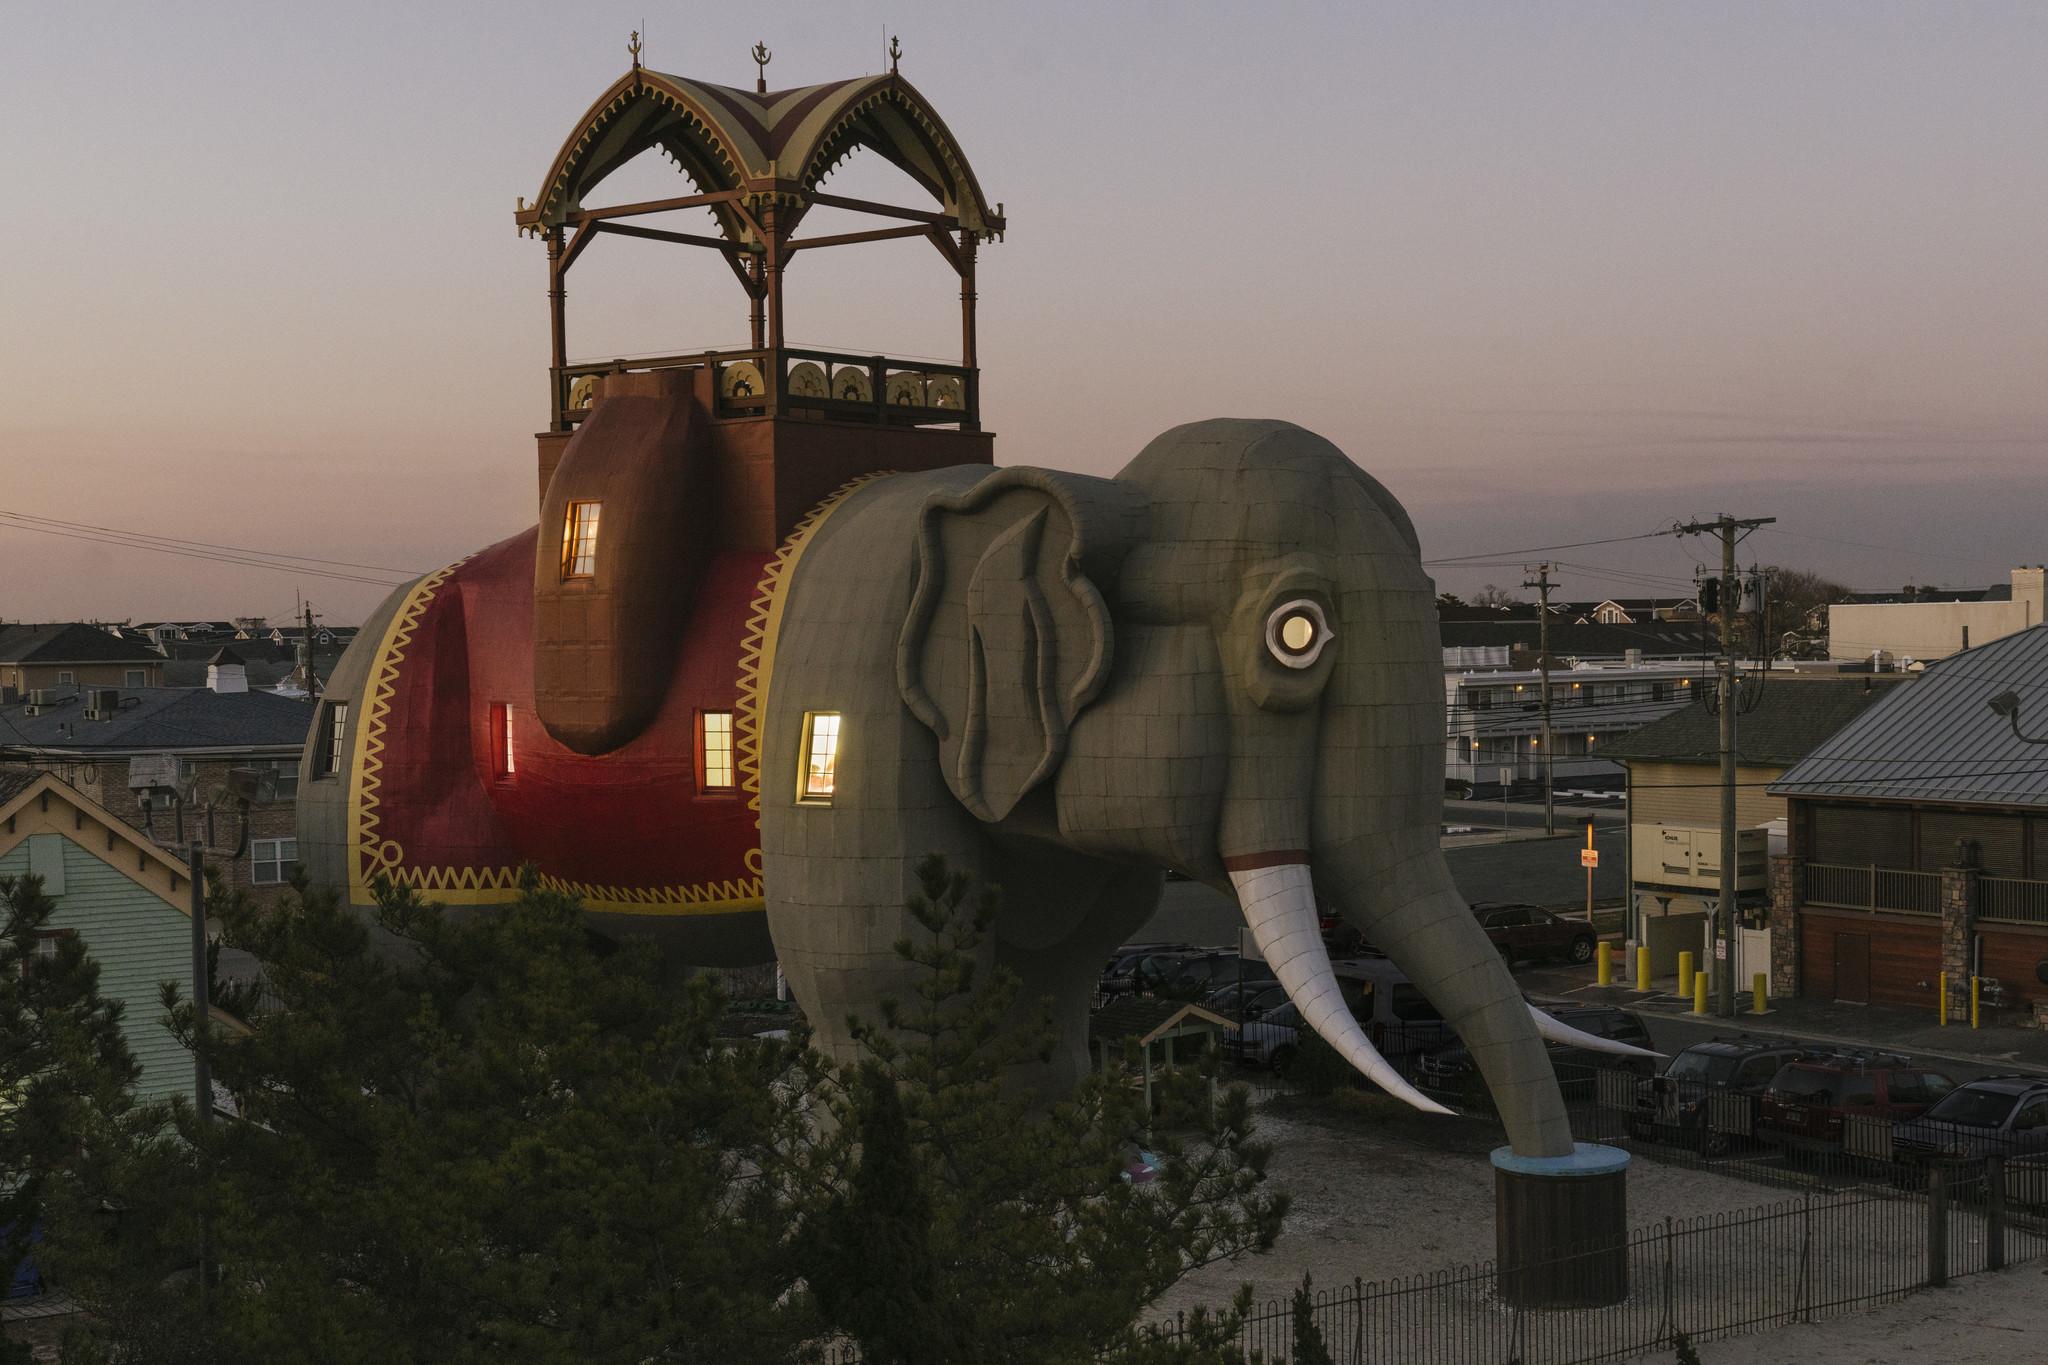 You can now sleep inside a giant landmark elephant on the Jersey Shore